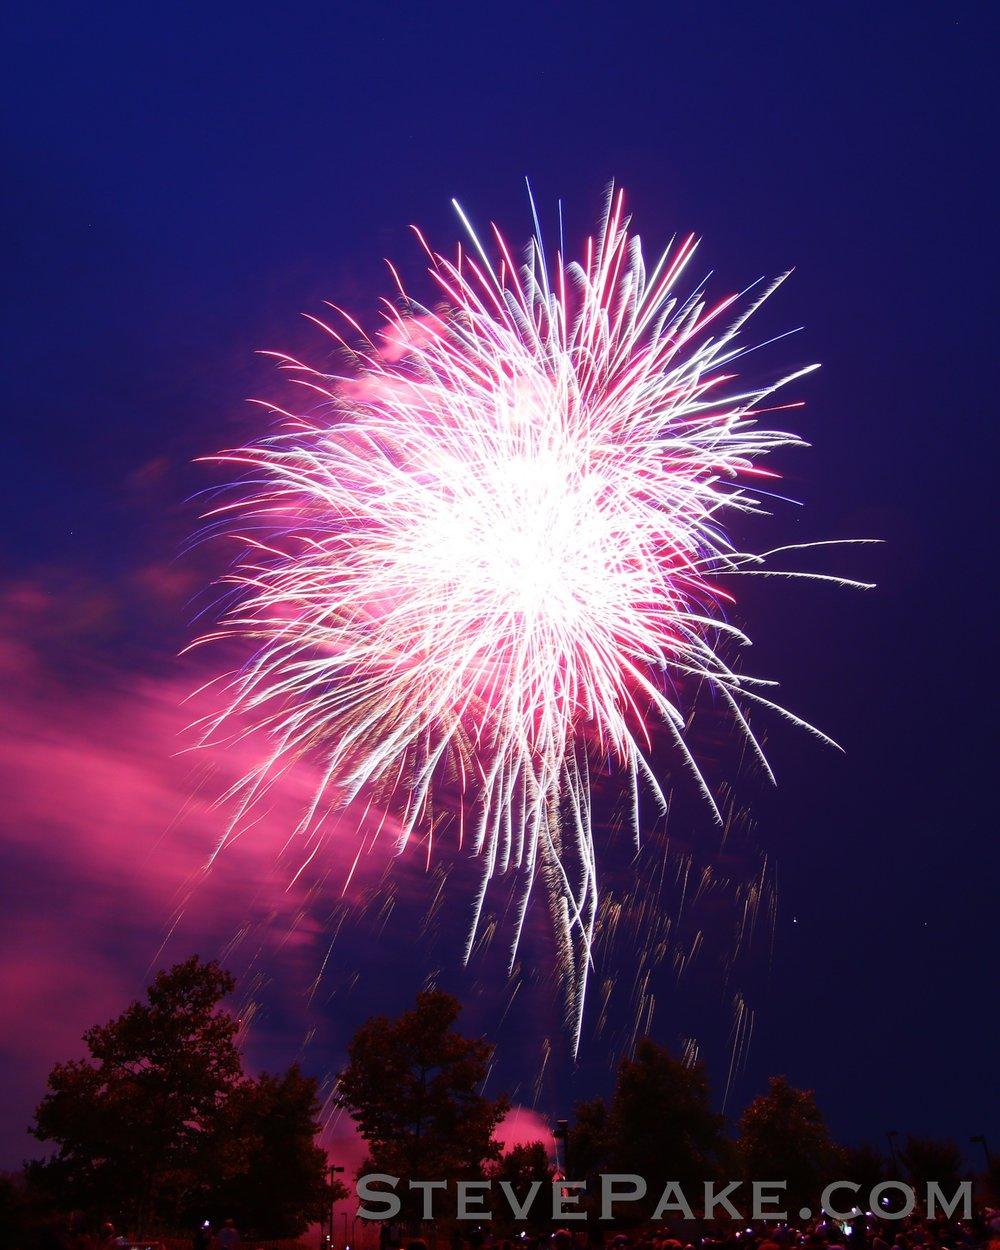 Fireworks2018_11_GE3A8509ap-HD-WM.jpg